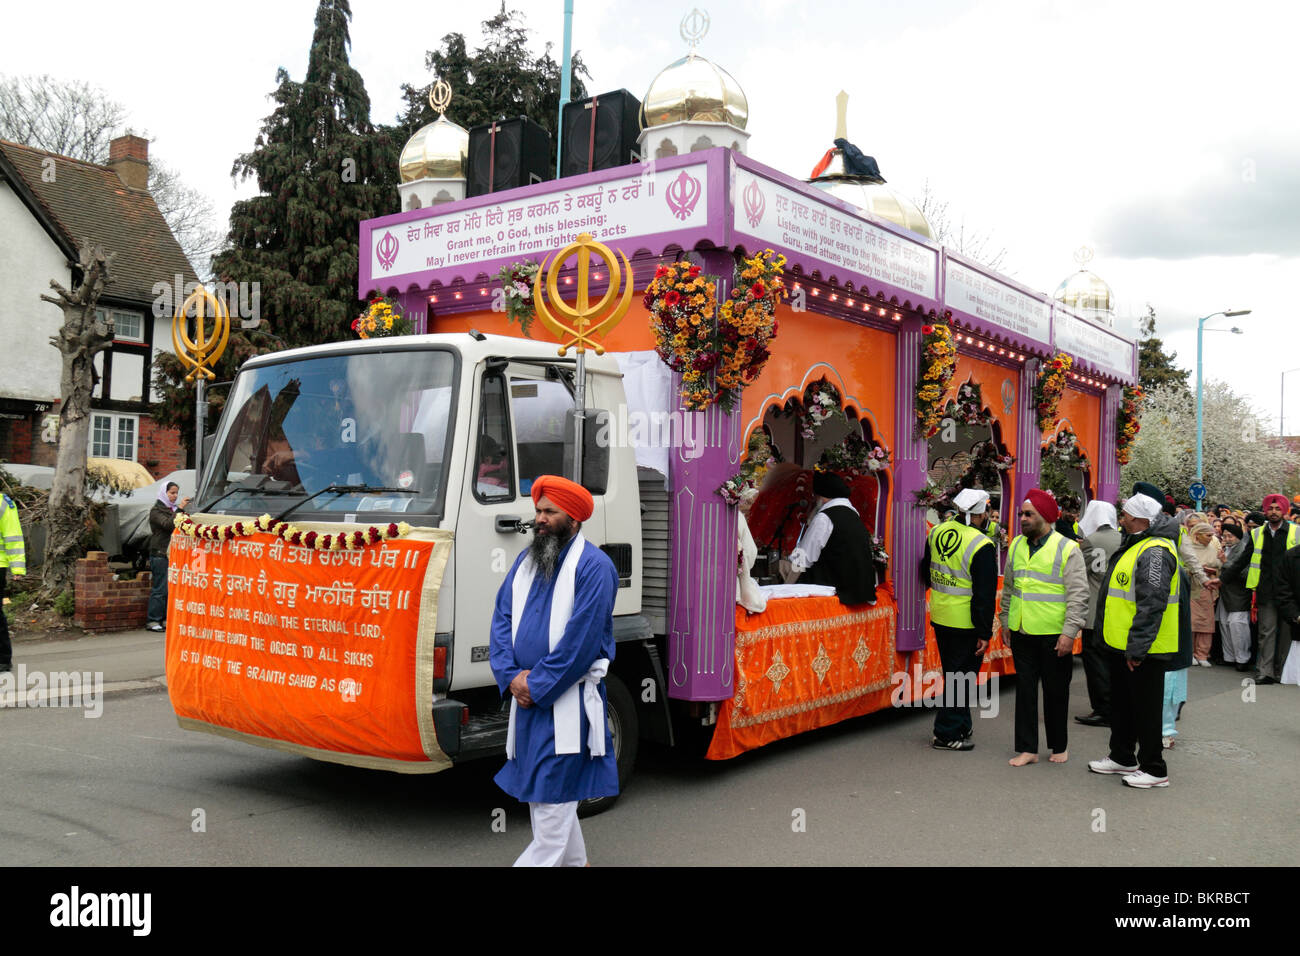 The Sri Guru Granth Sahib (Sikh holy book) beign escorted at the annual Vaisakhi Nagar Kirtan (procession) Hounslow, - Stock Image